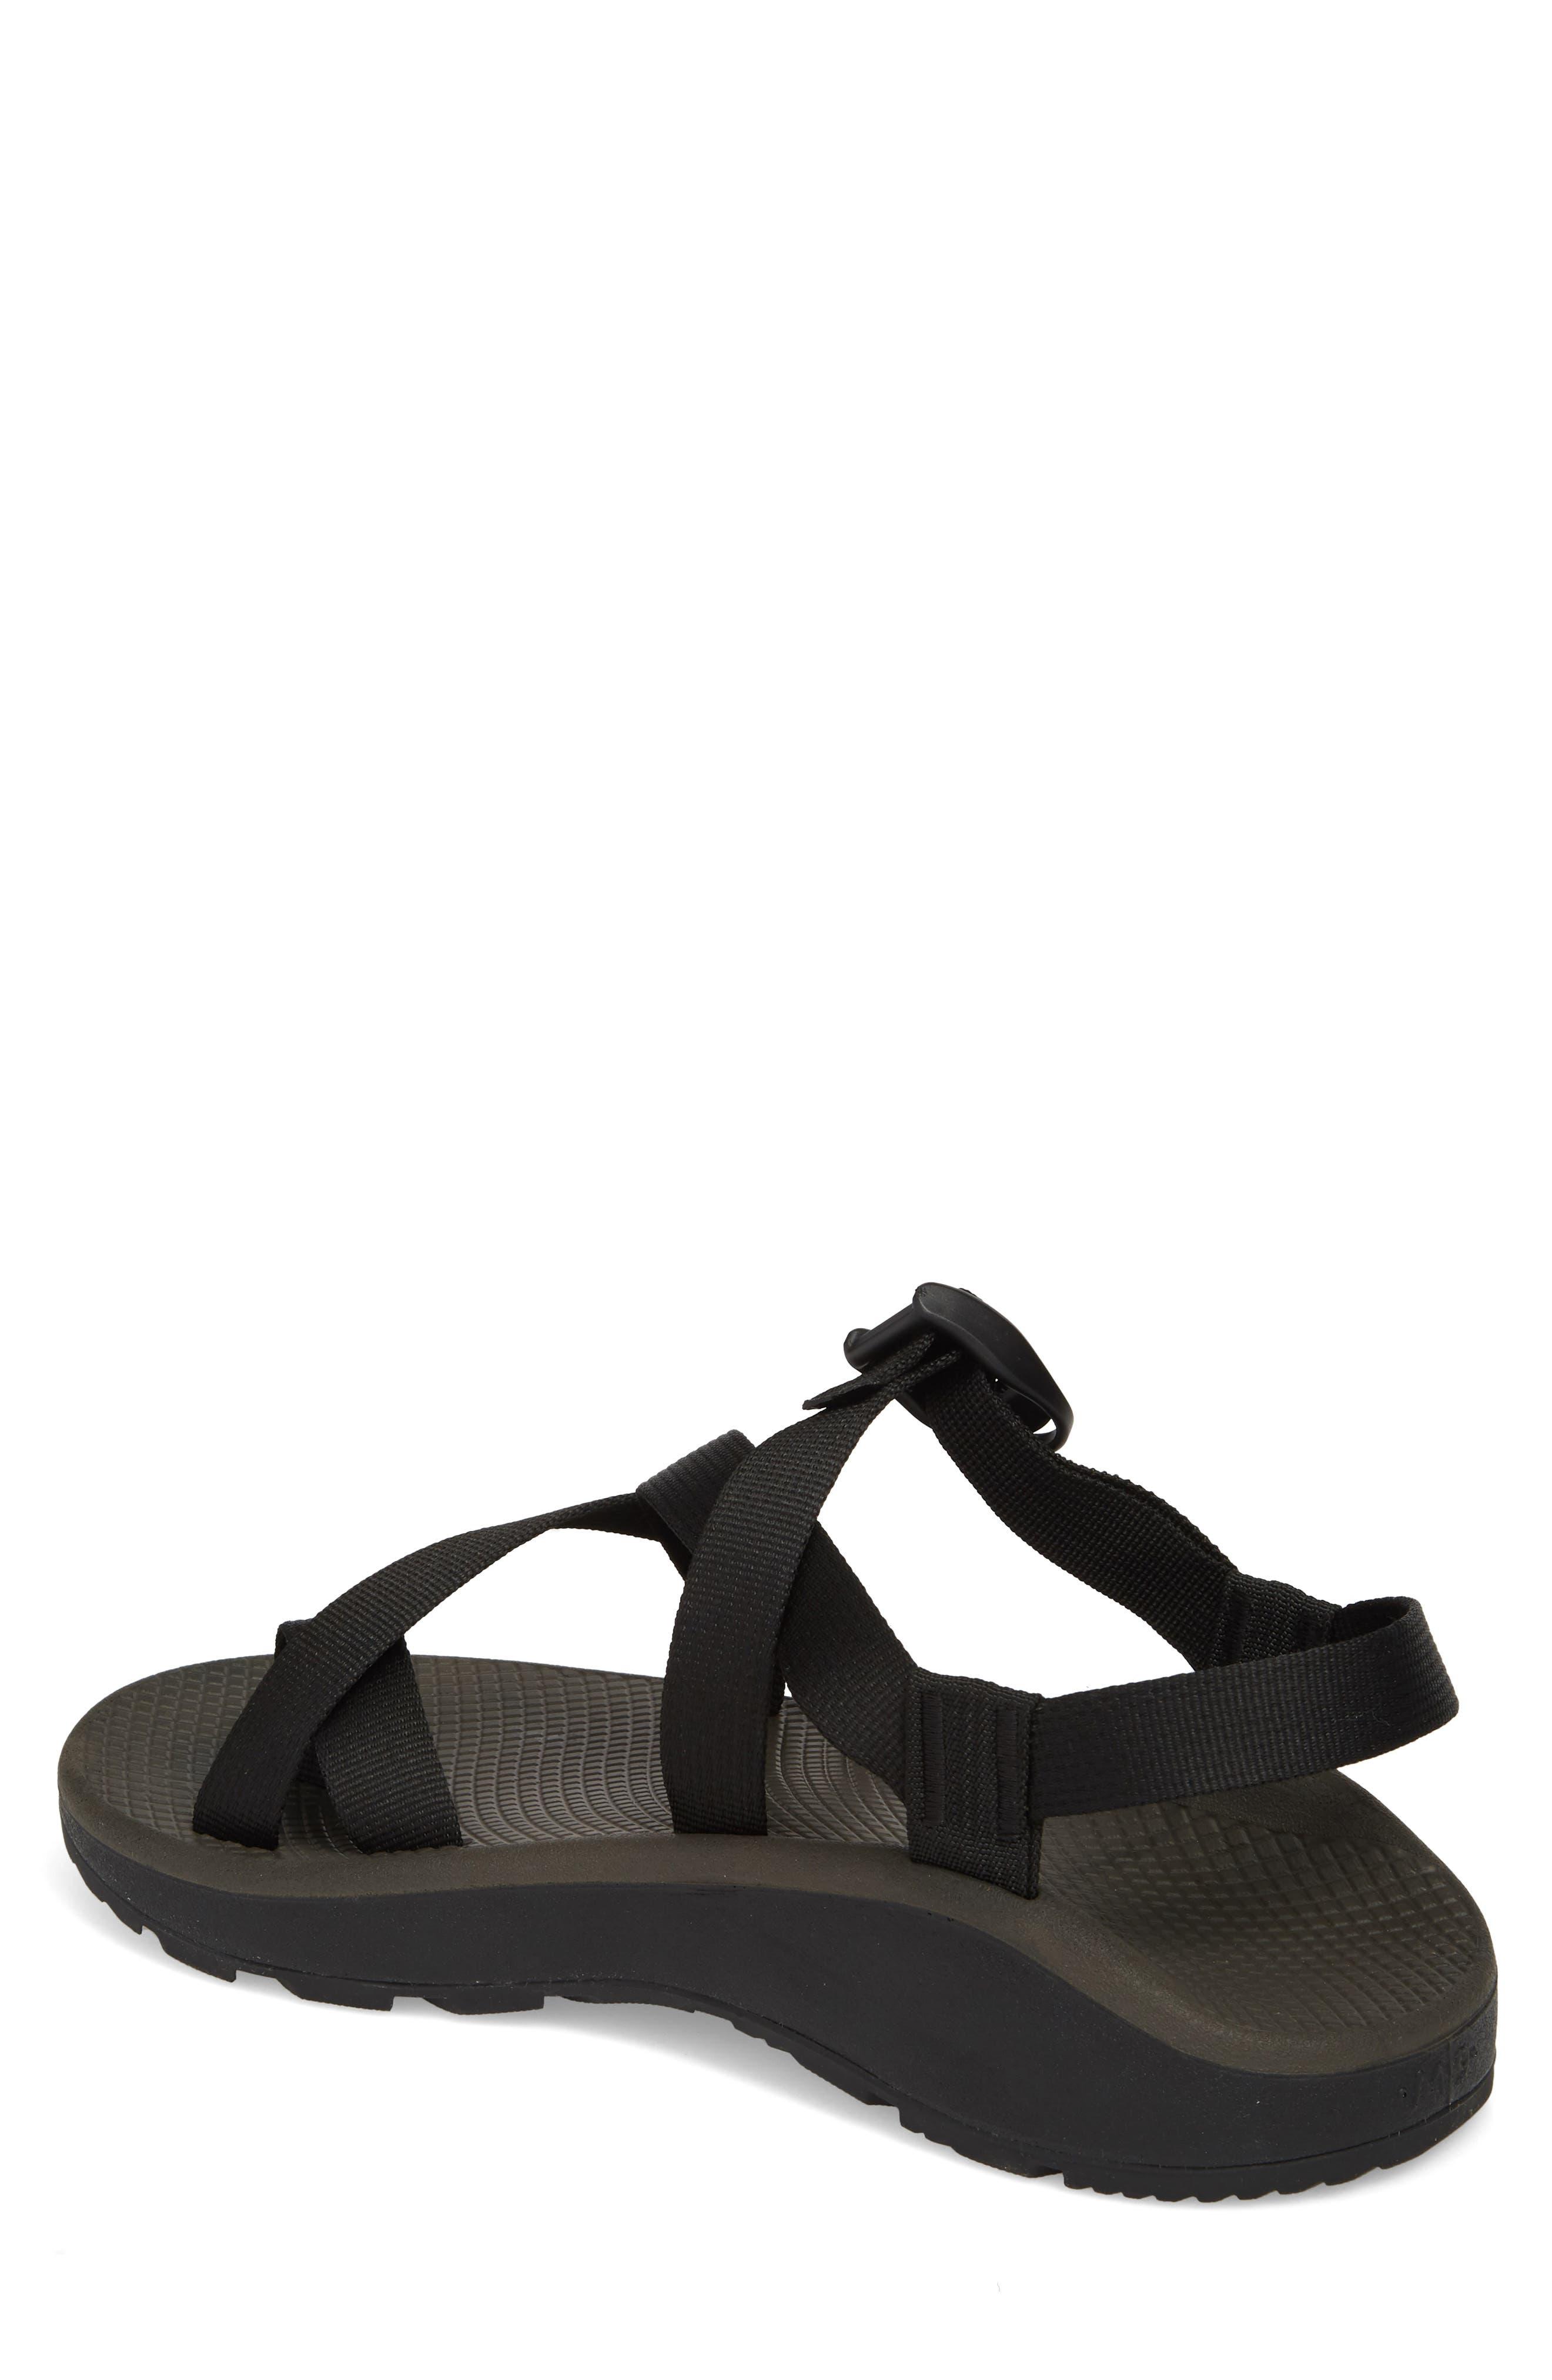 Z/Cloud 2 Sport Sandal,                             Alternate thumbnail 2, color,                             BLACK